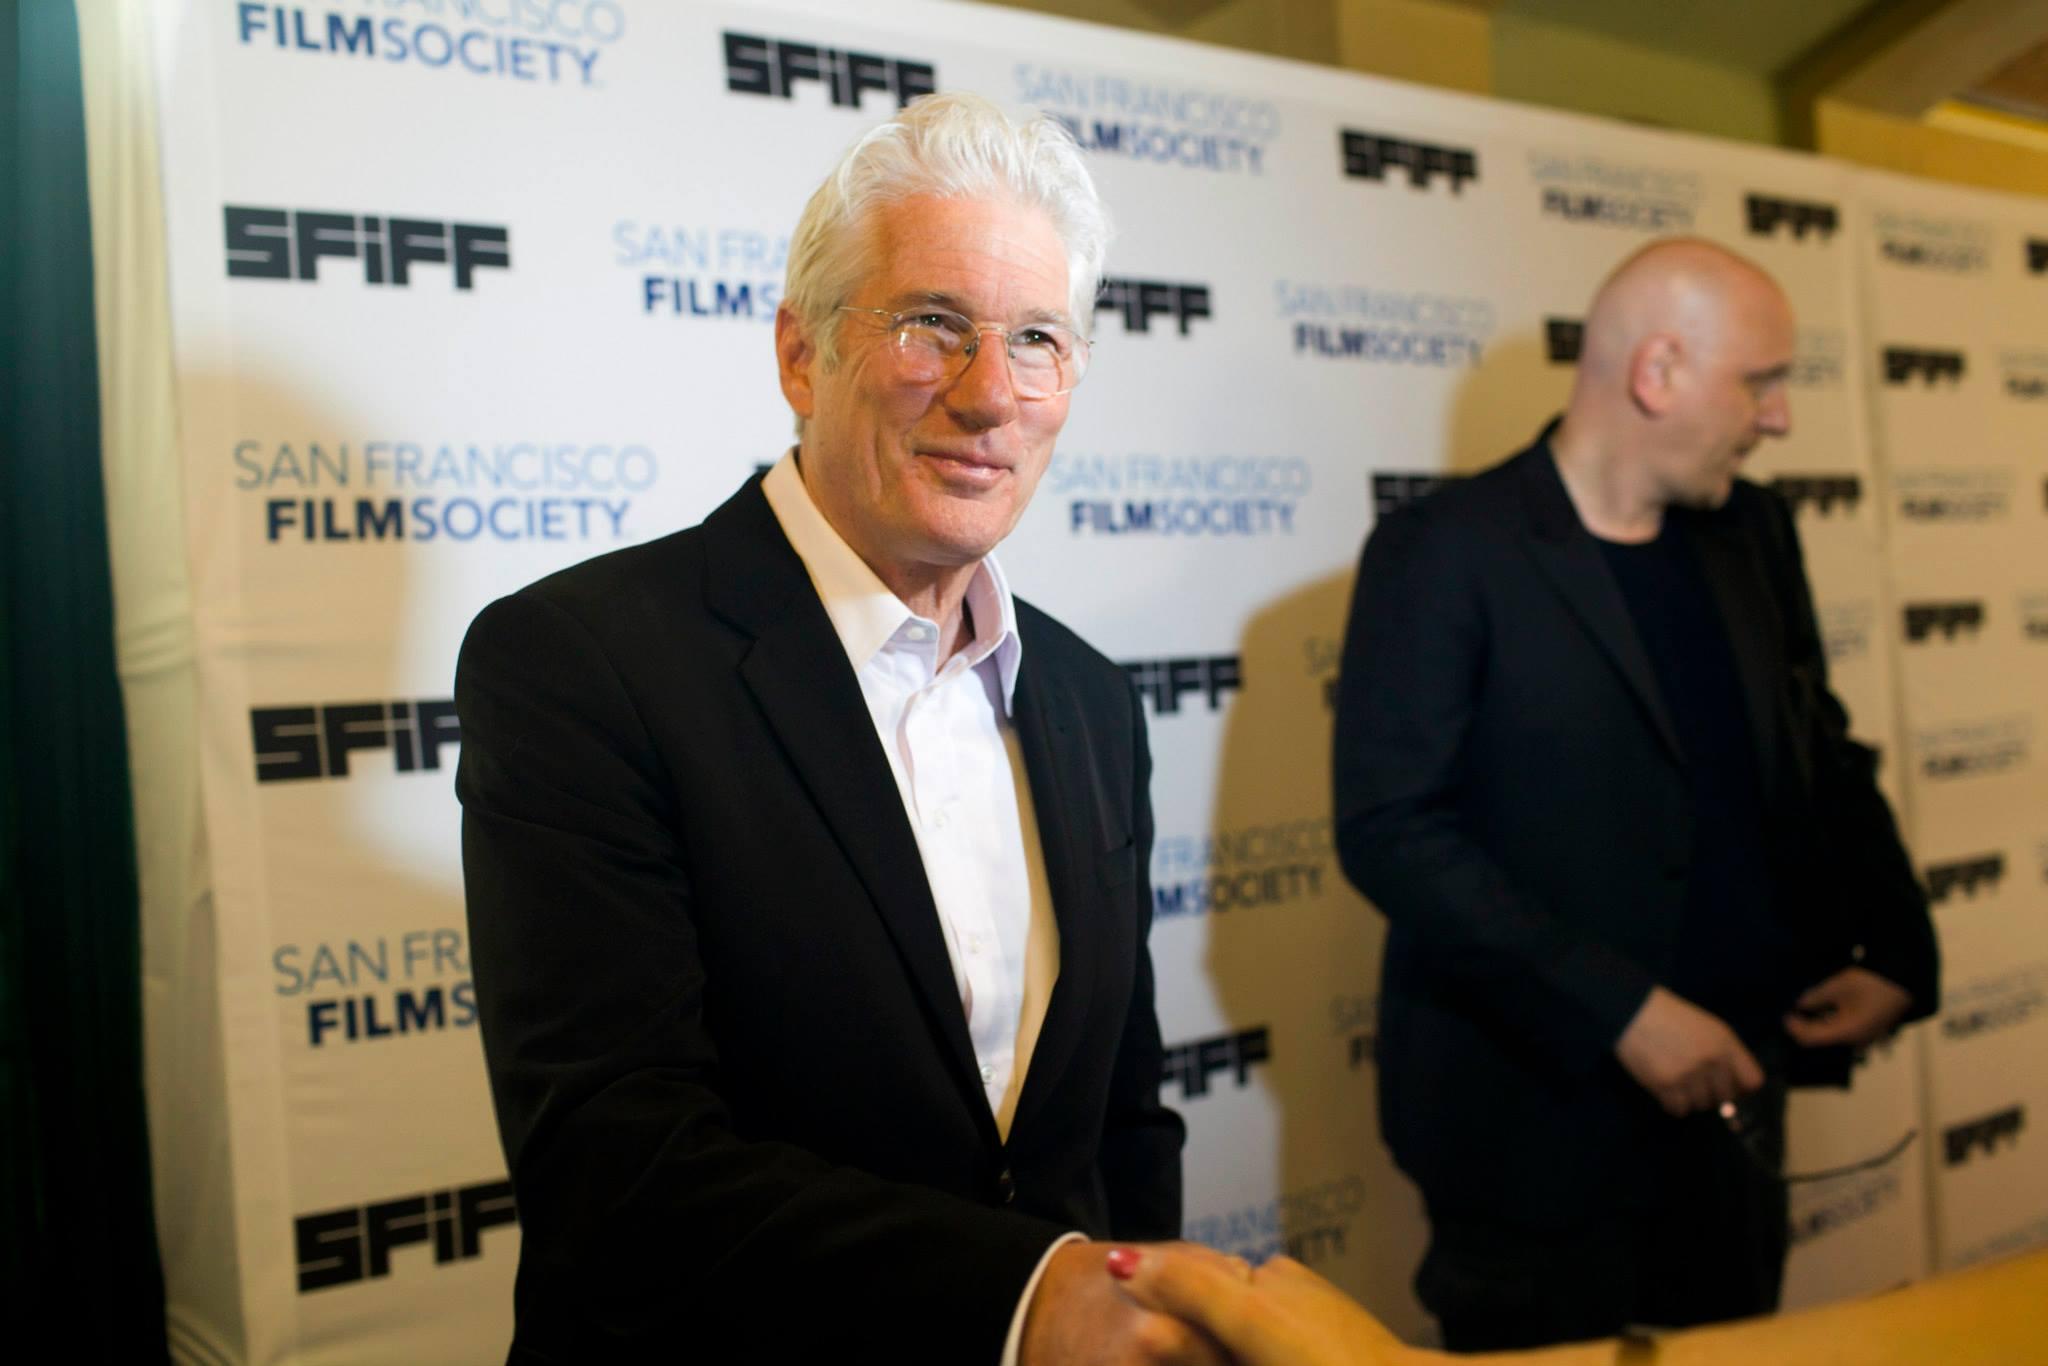 Richard Gere, recipient of SFIFF58's Peter J. Owens Award